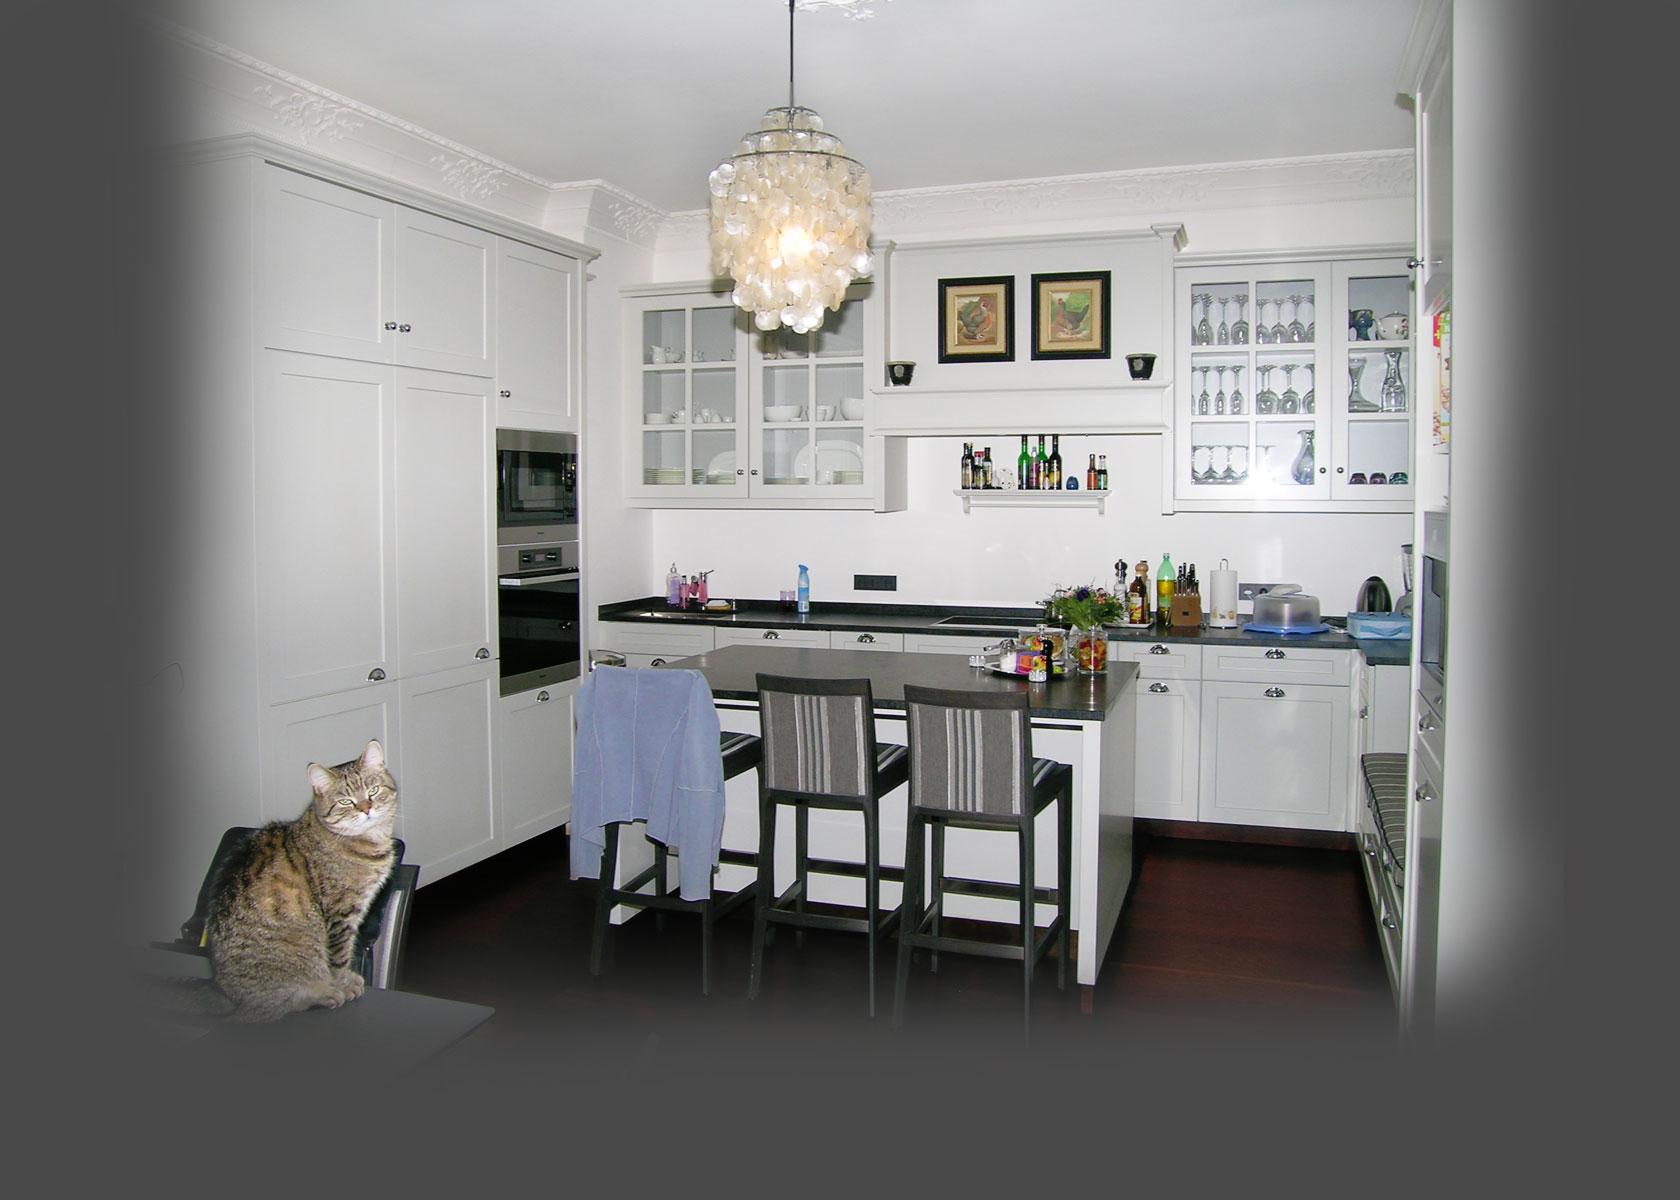 viktorianische k che. Black Bedroom Furniture Sets. Home Design Ideas